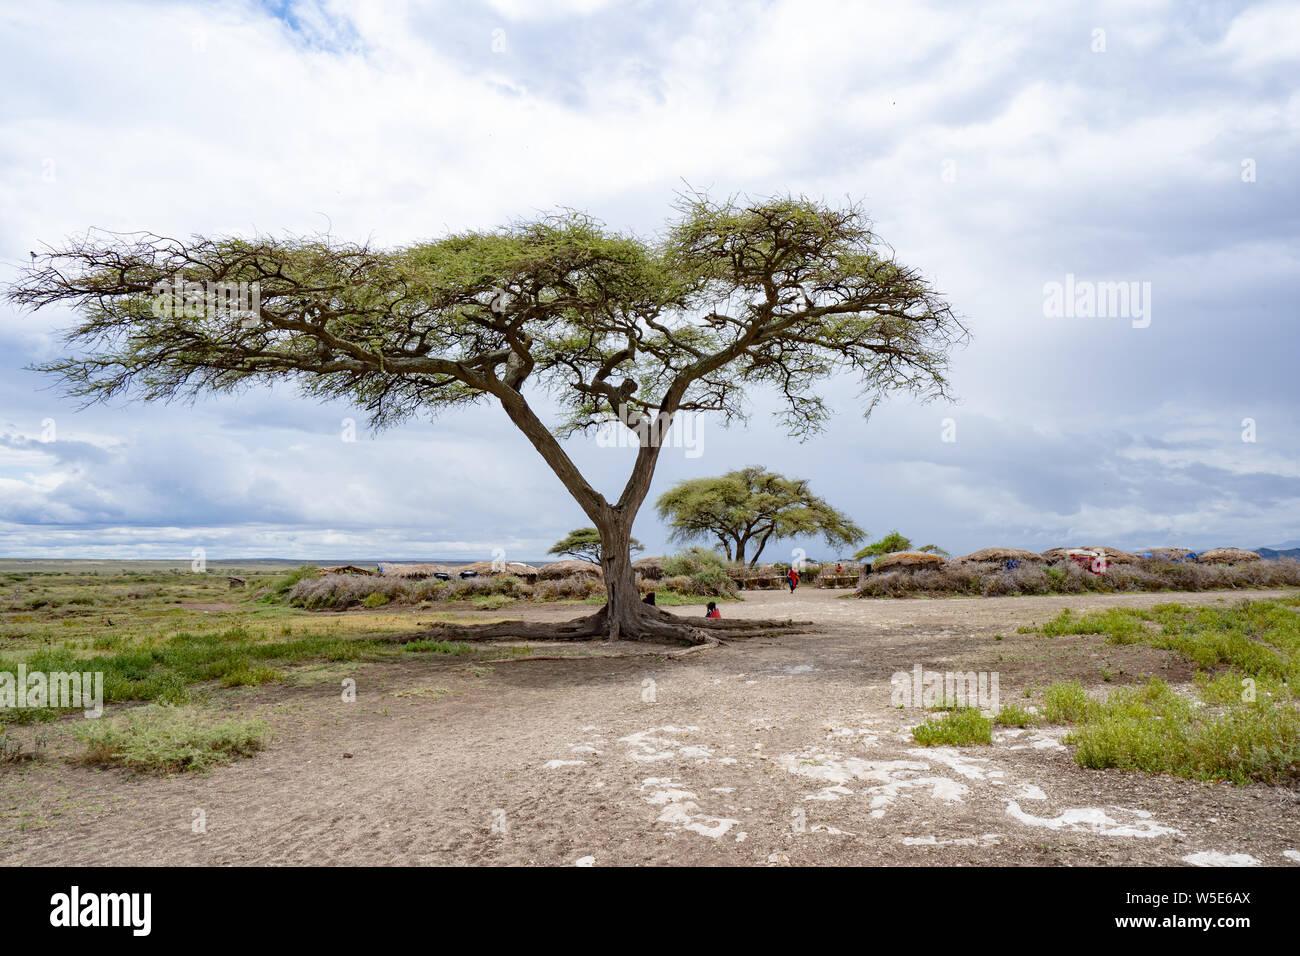 Acacia tree at Serengeti National Park, Tanzania Stock Photo